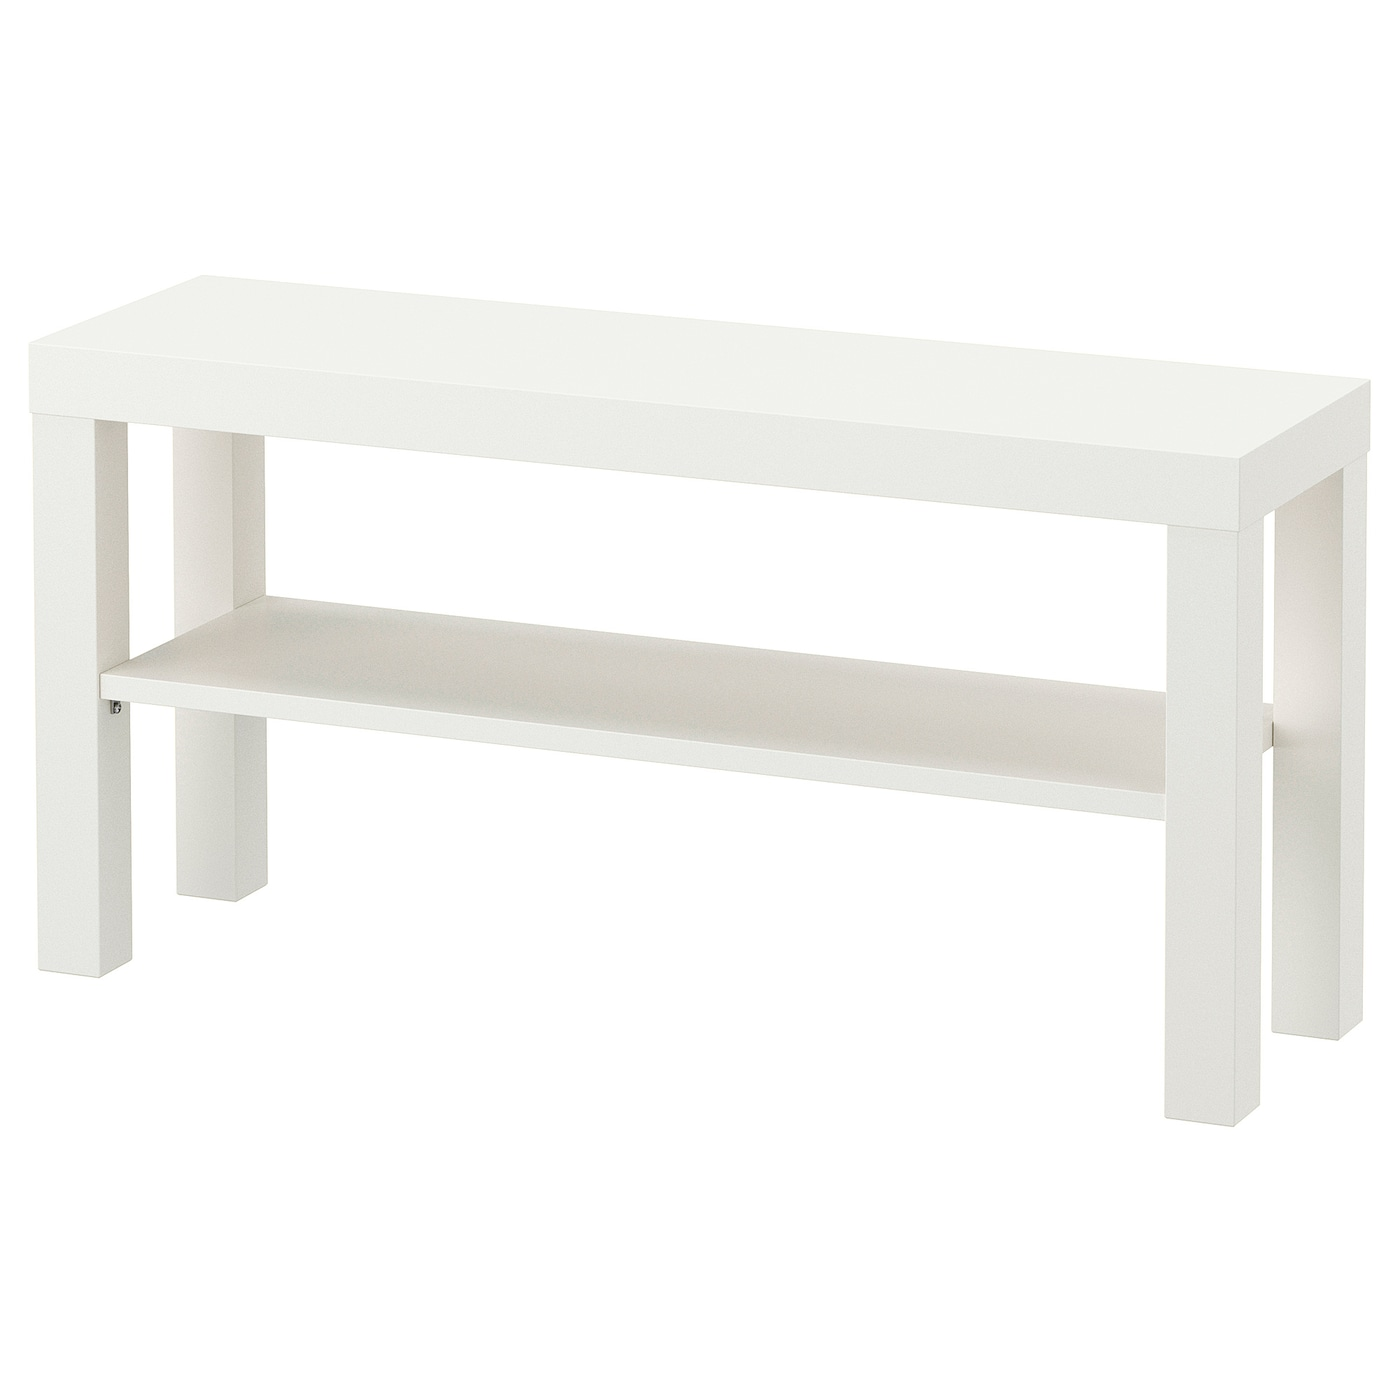 Lack mueble tv blanco 90 x 26 x 45 cm ikea for Mueble tv ikea